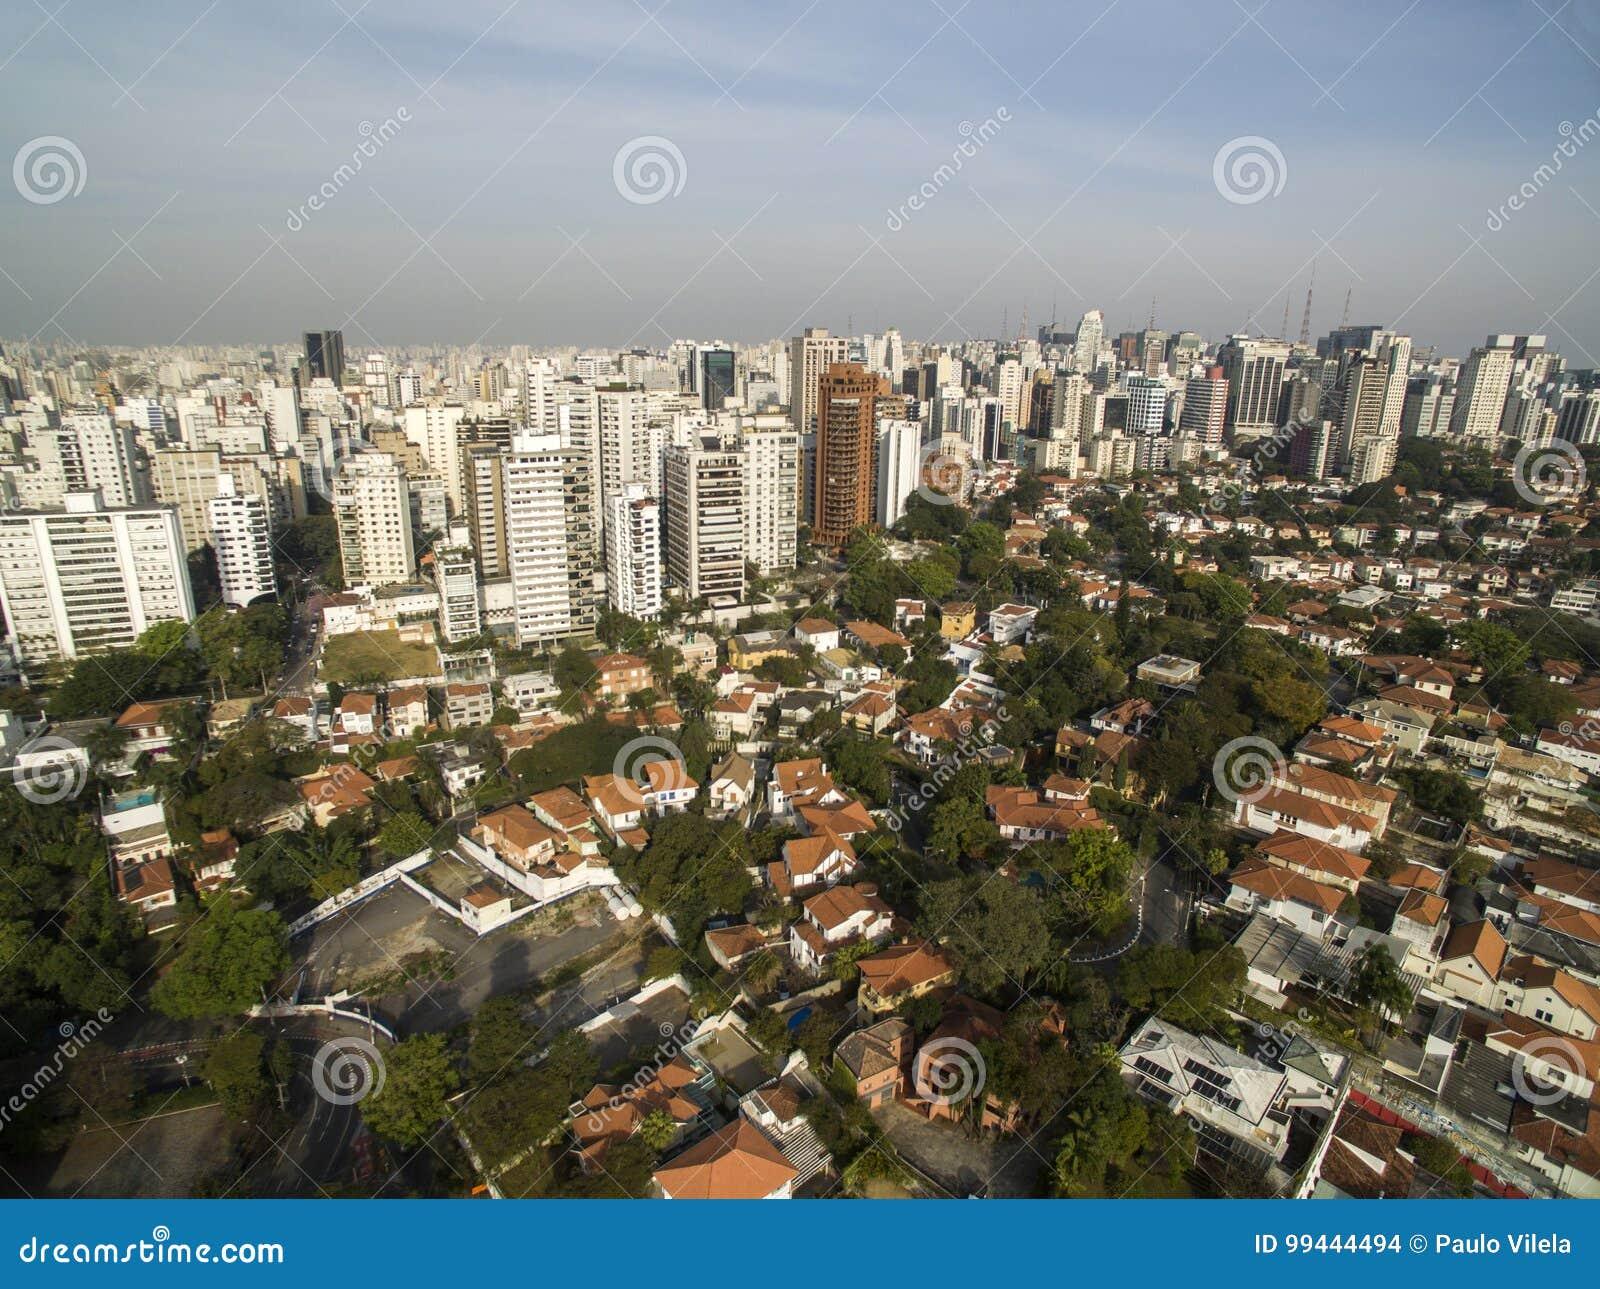 c61d9cd494 Sao Paulo